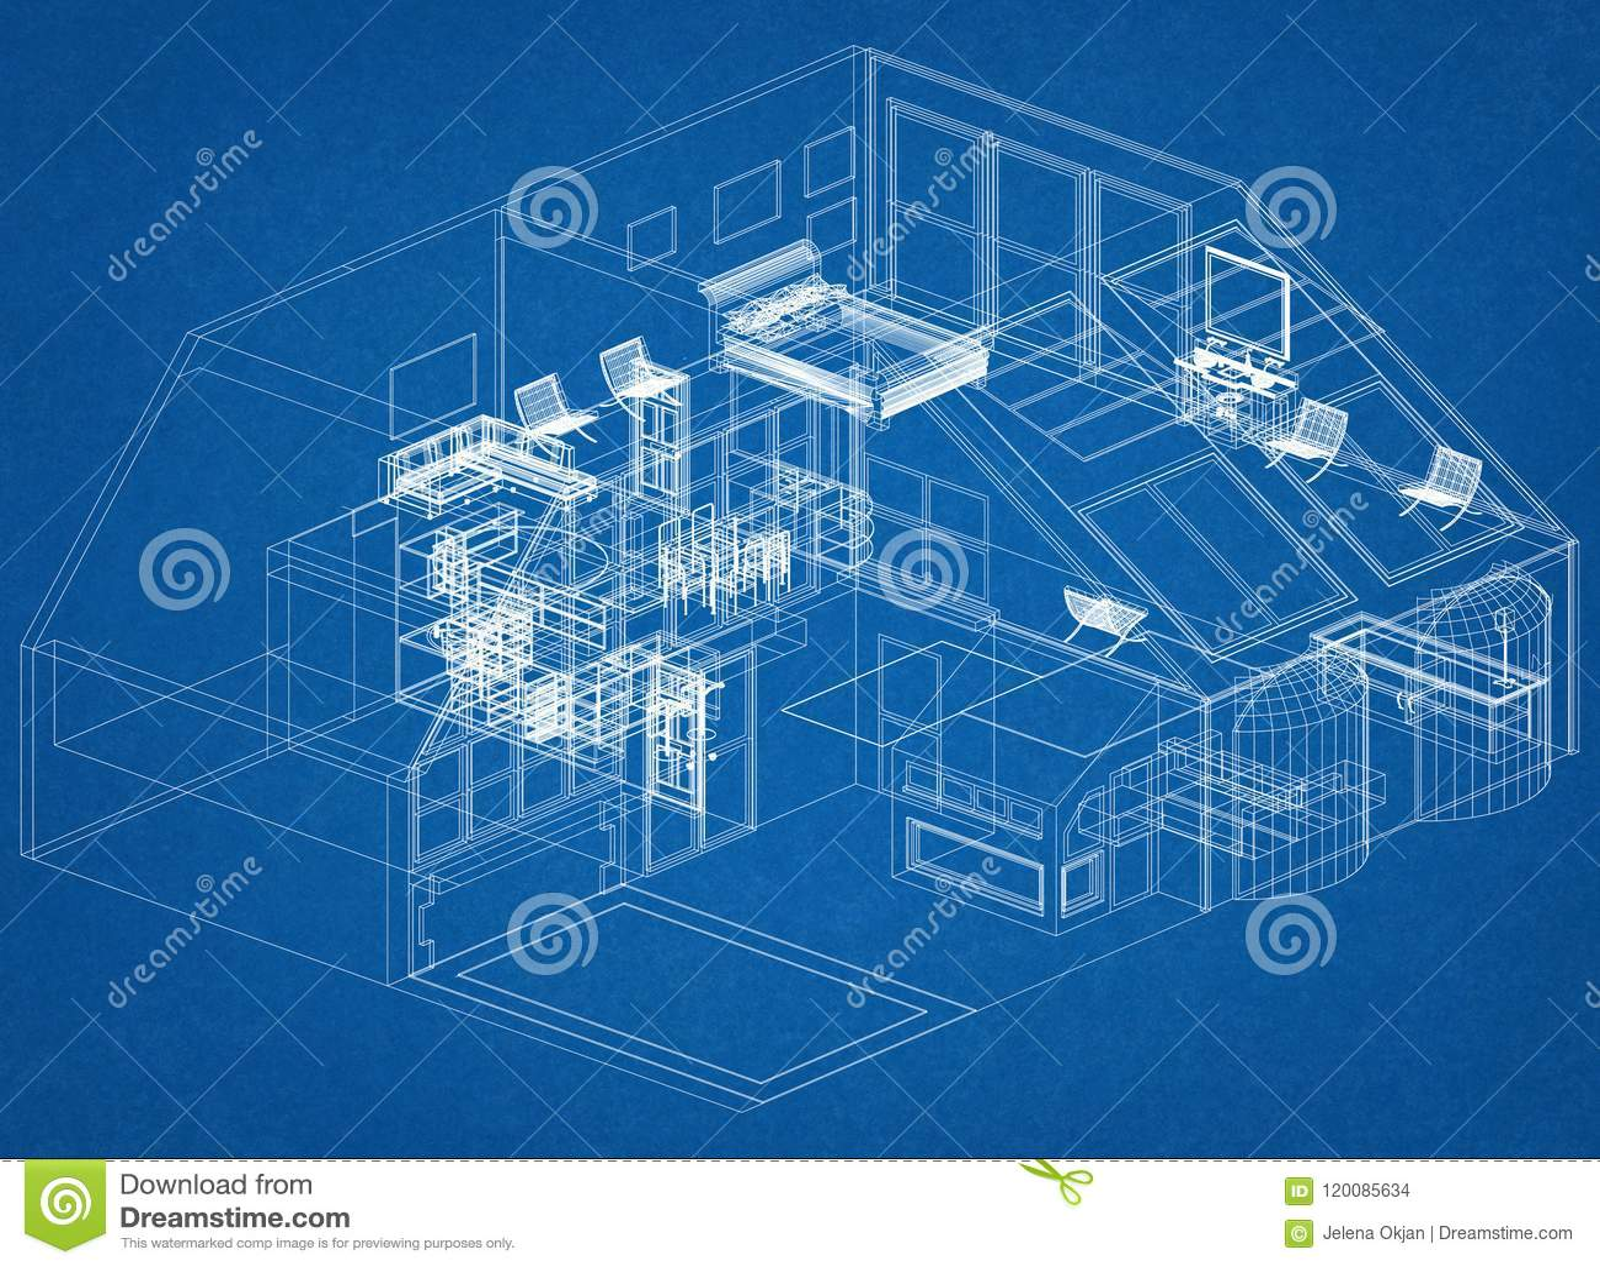 modern architecture blueprints high resolution modern house design architect blueprint stock illustration